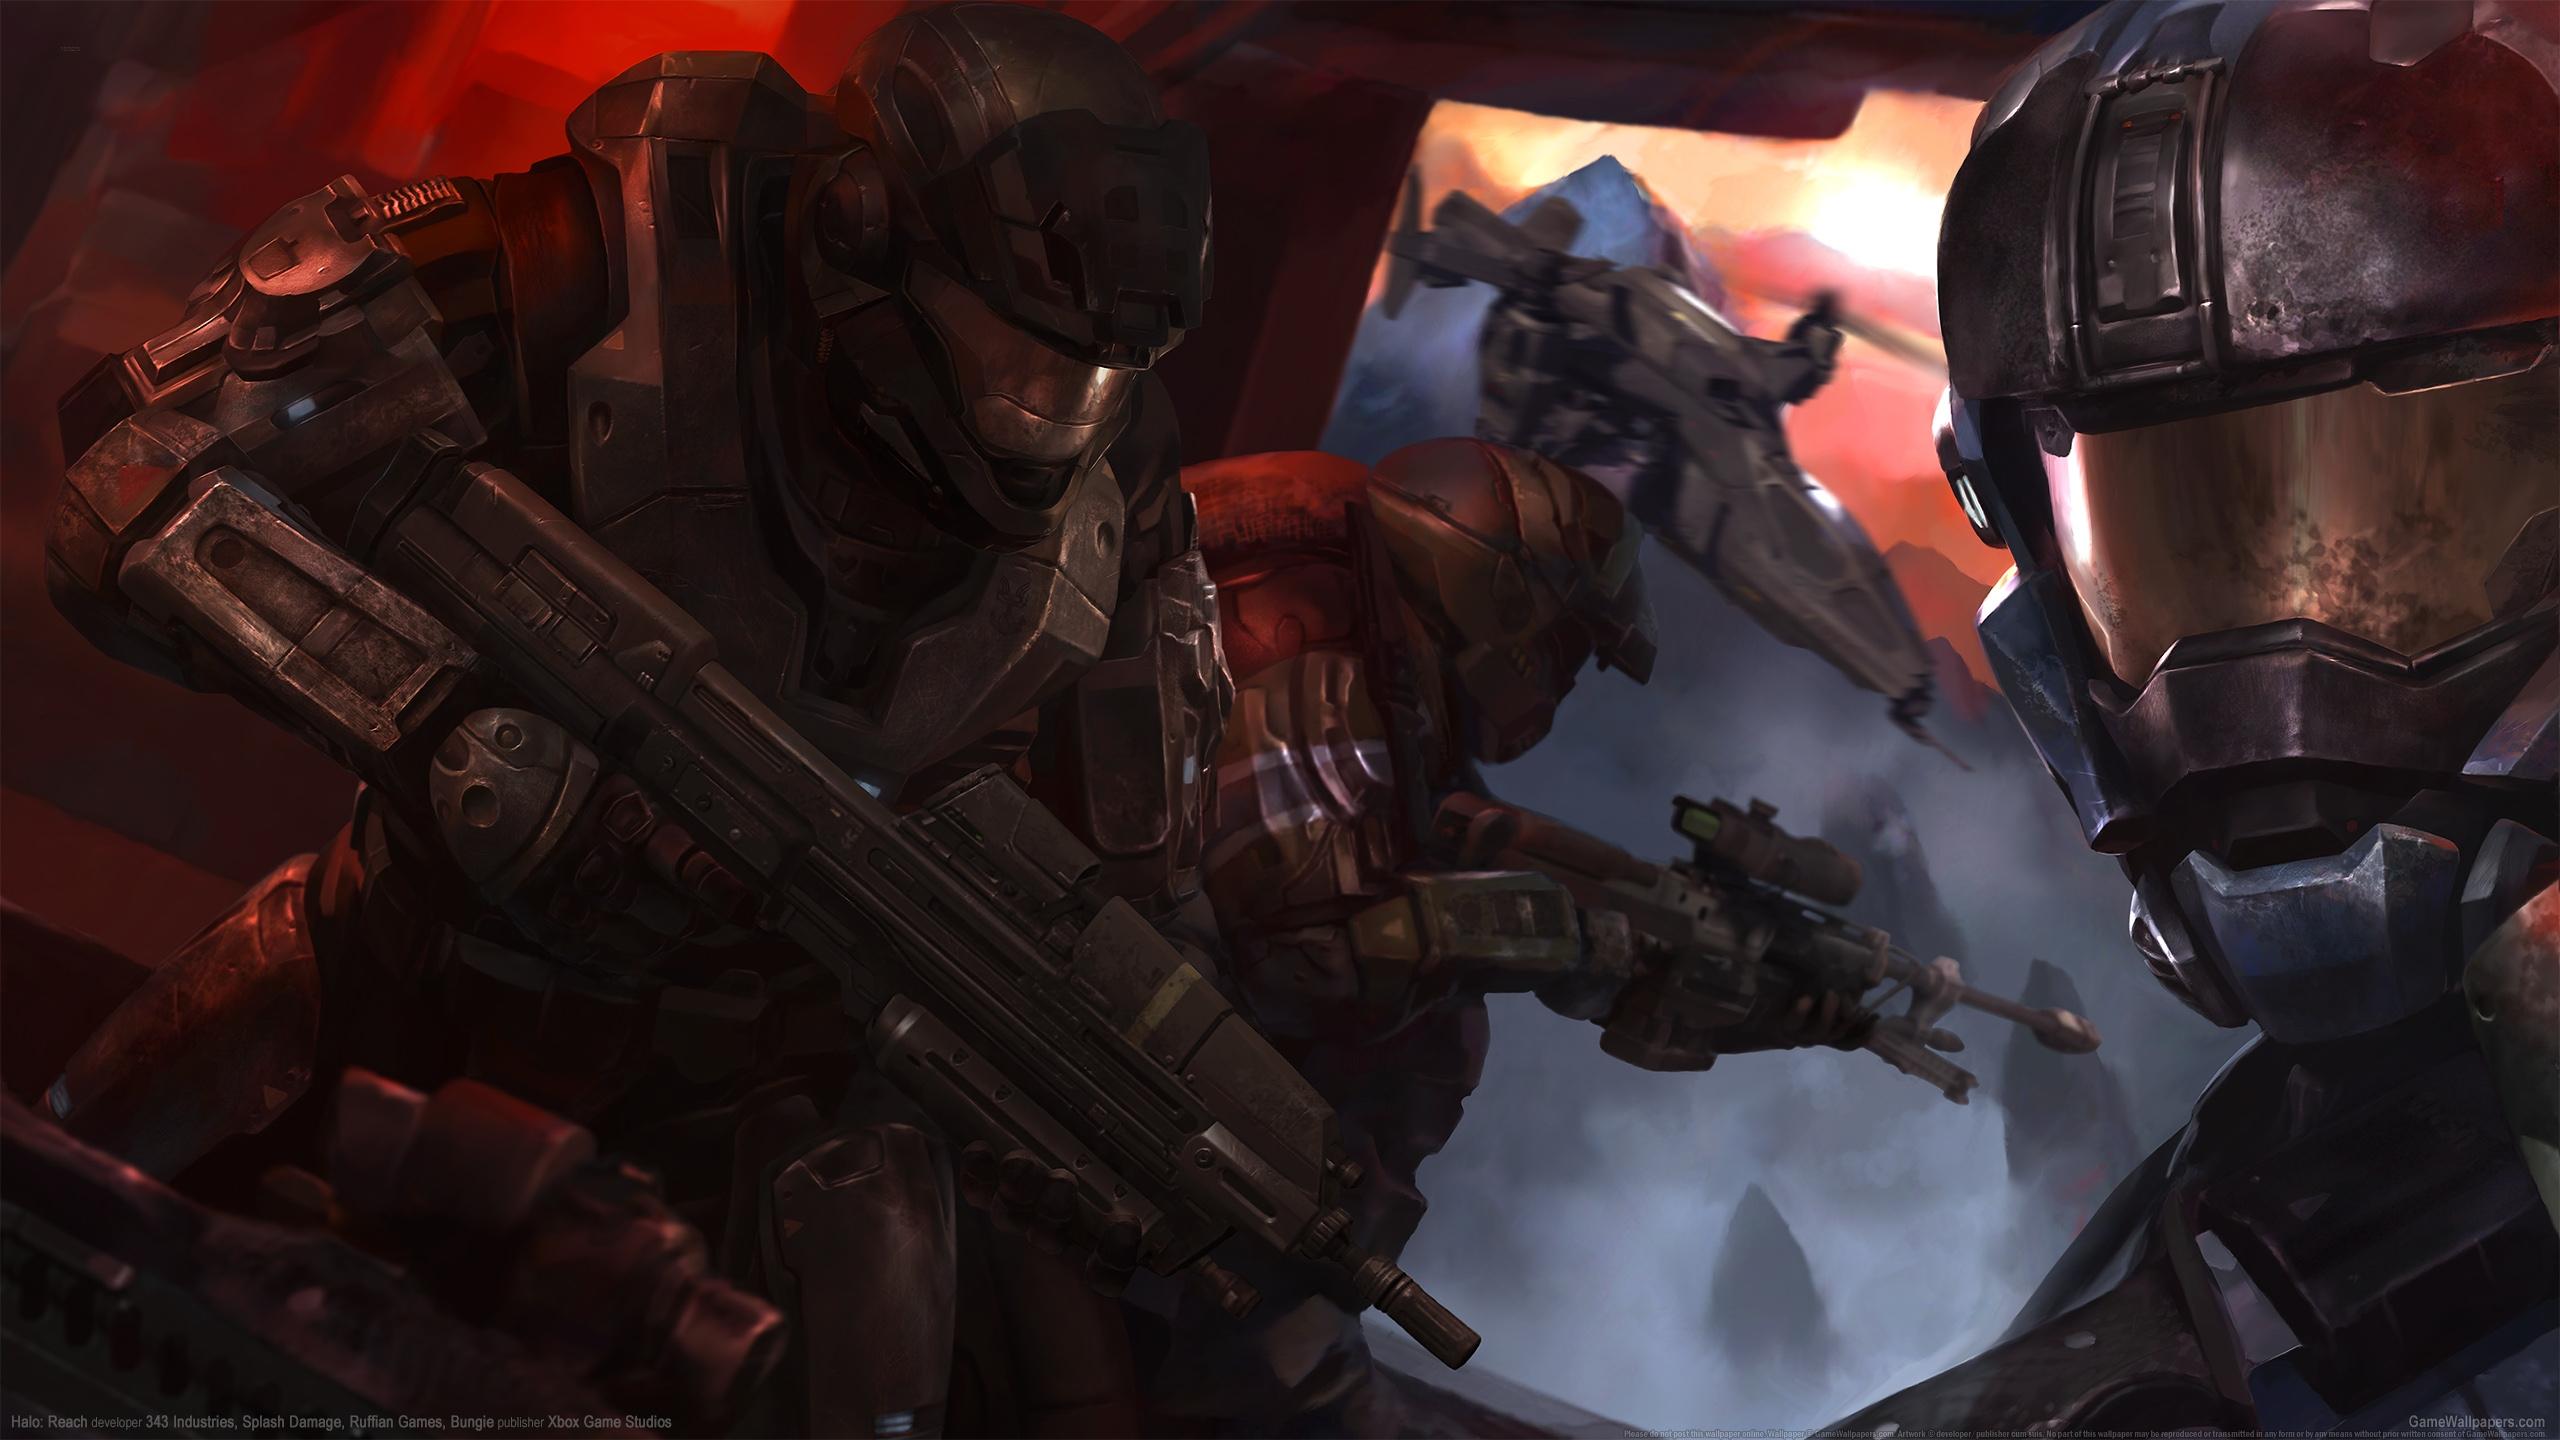 Halo: Reach 2560x1440 Hintergrundbild 09